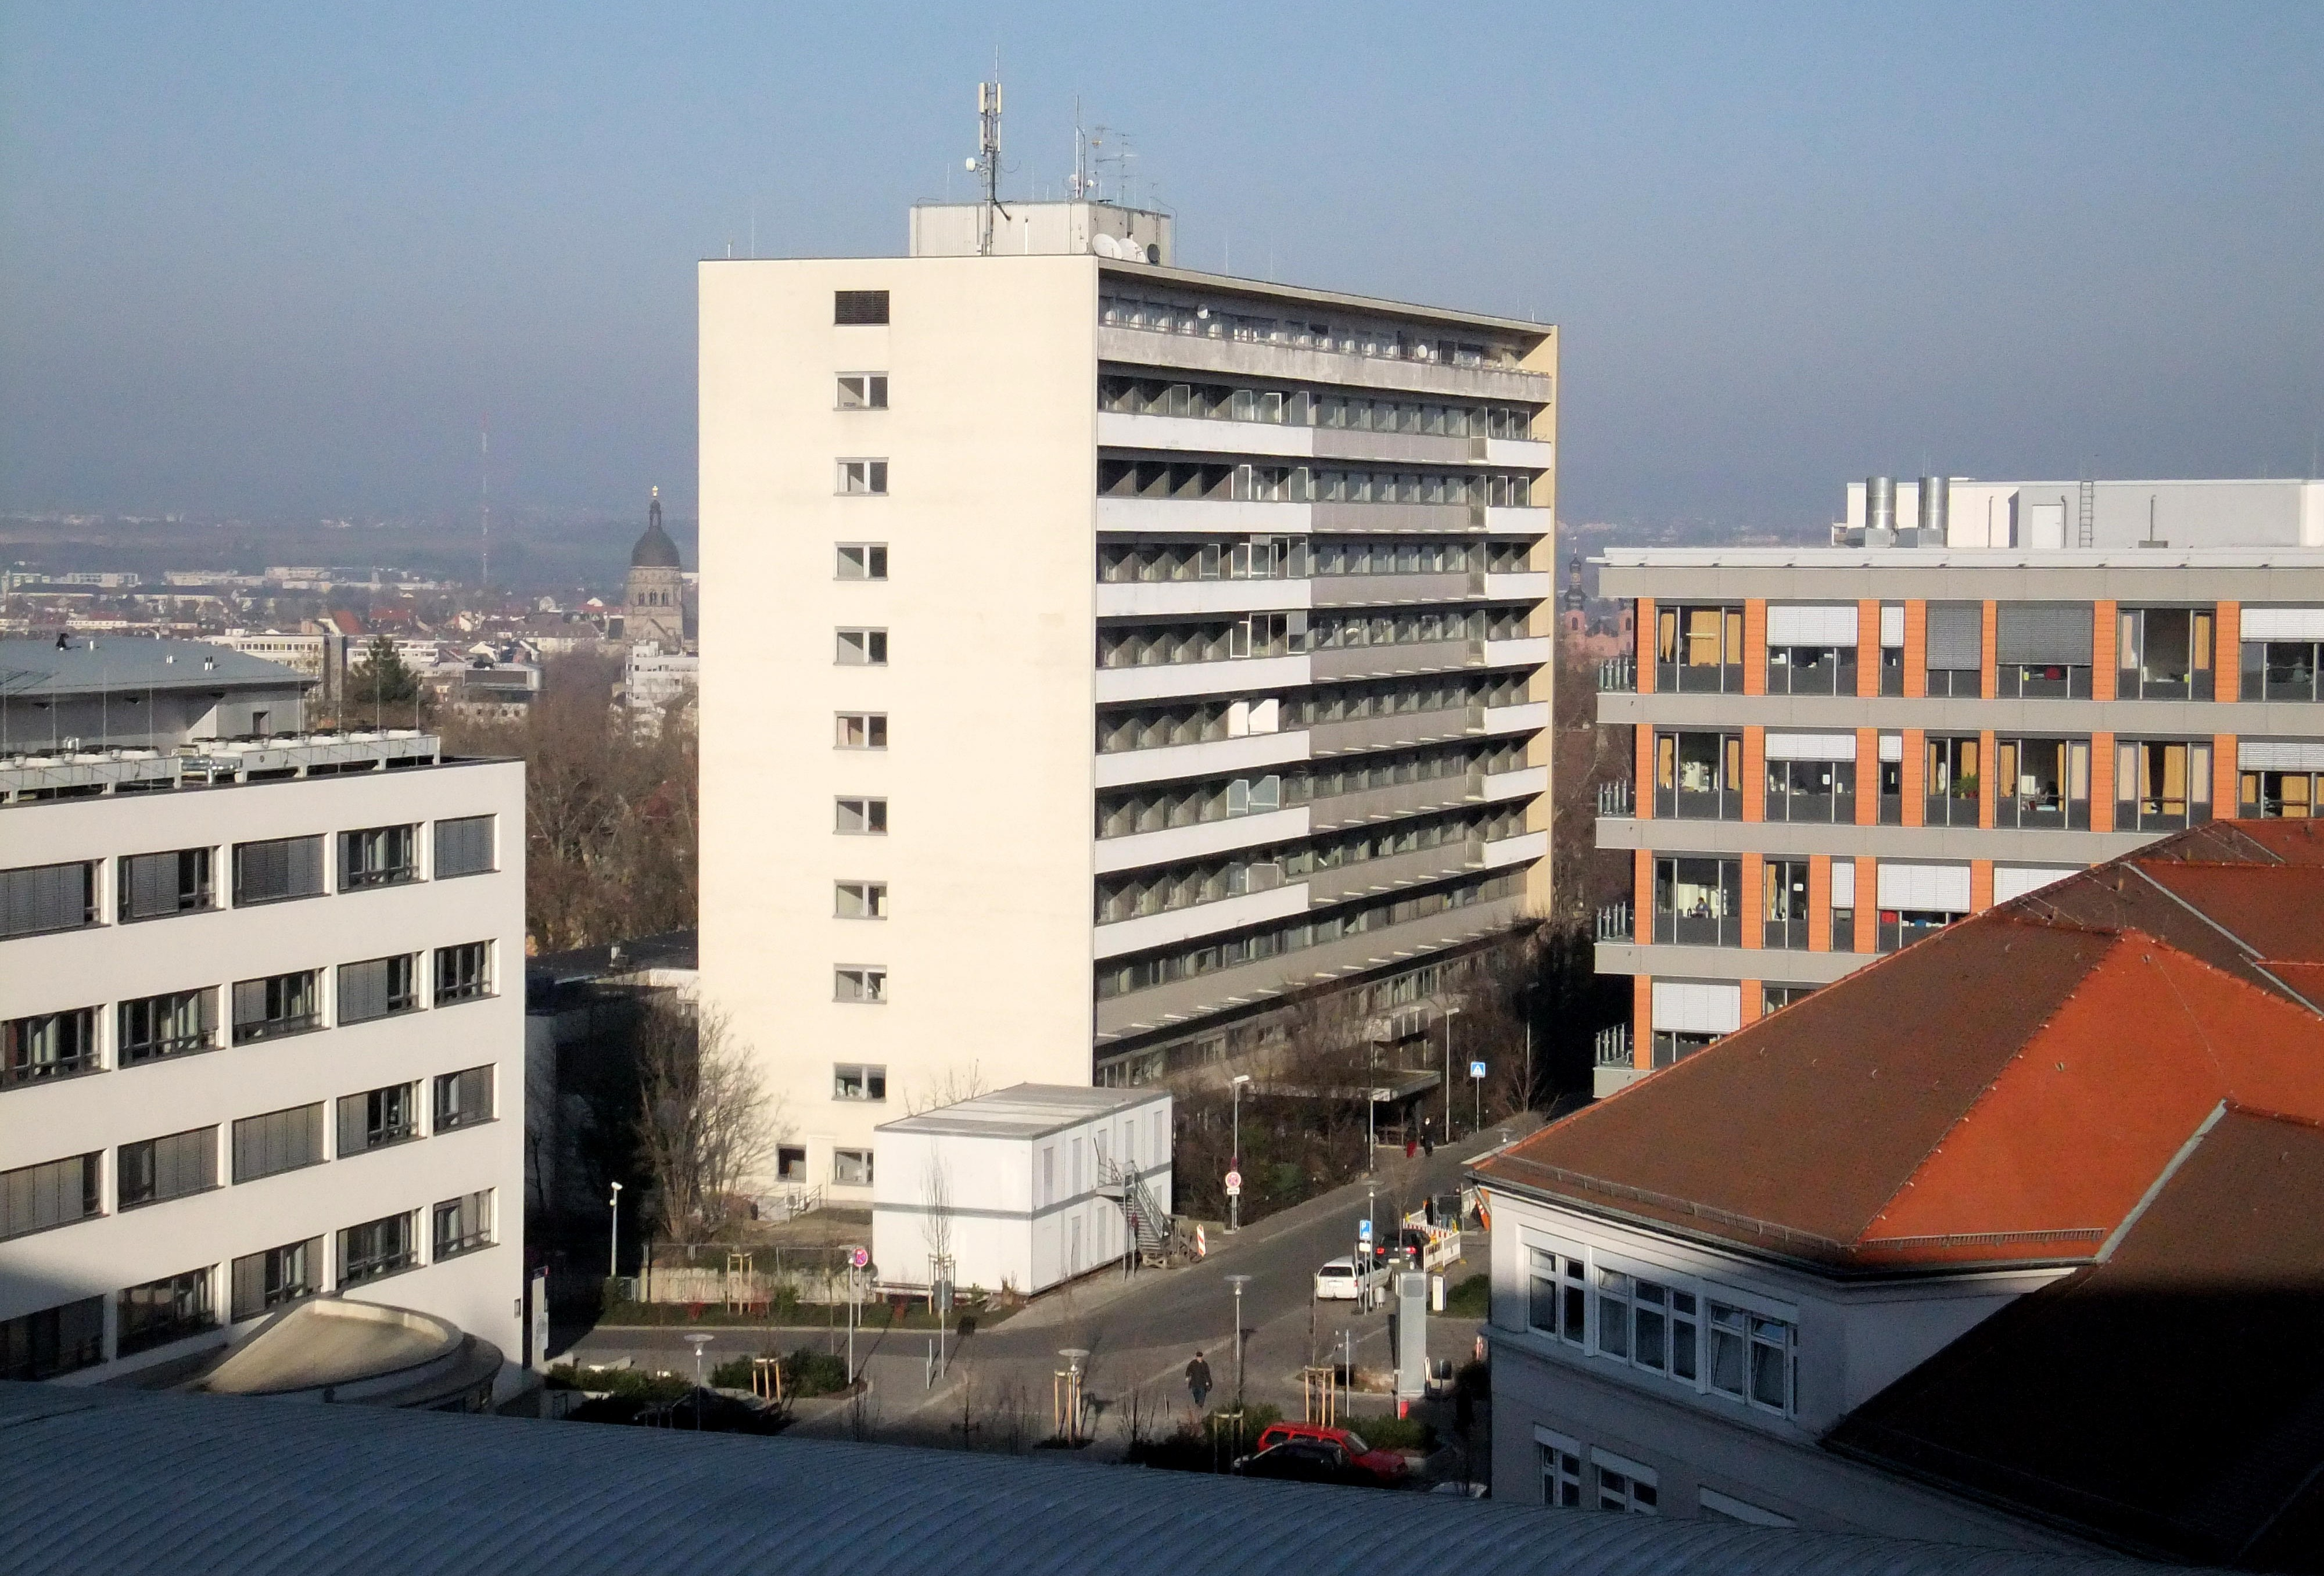 Datei:Mainz- Universitätsmedizin- Gebäude 701 ...